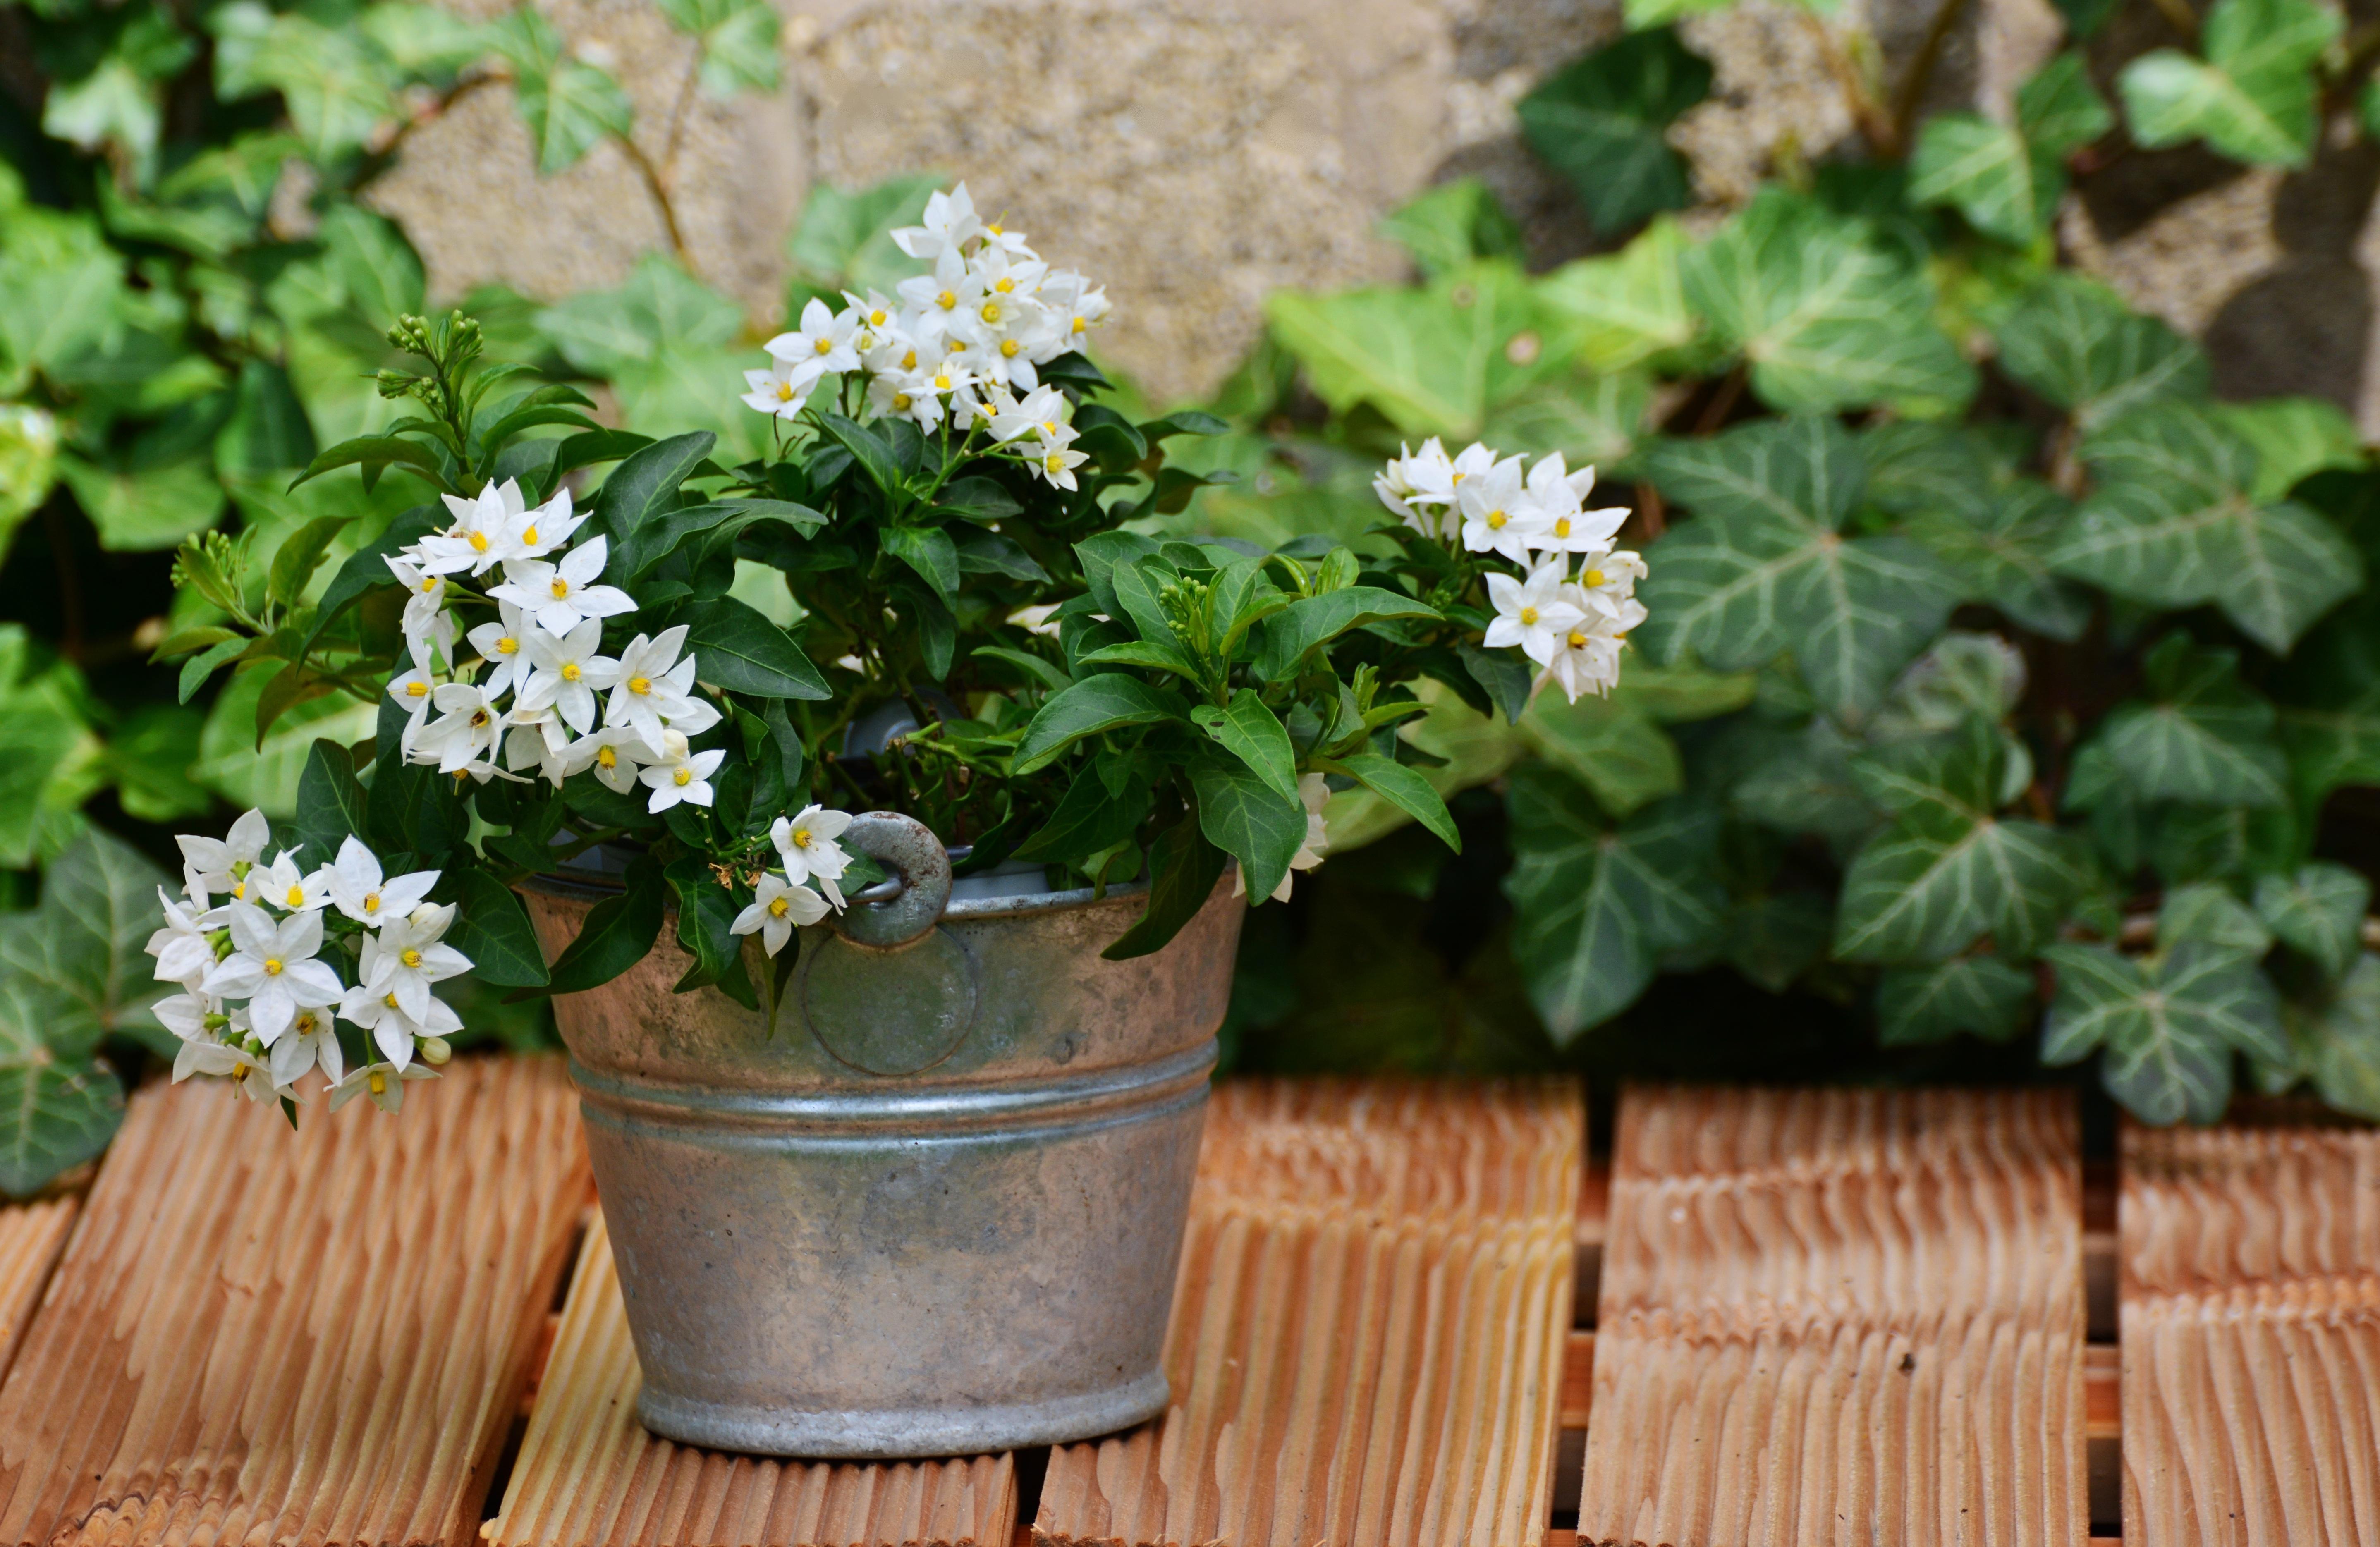 Images Gratuites Herbe Jardin Arrangement Salutation Florale